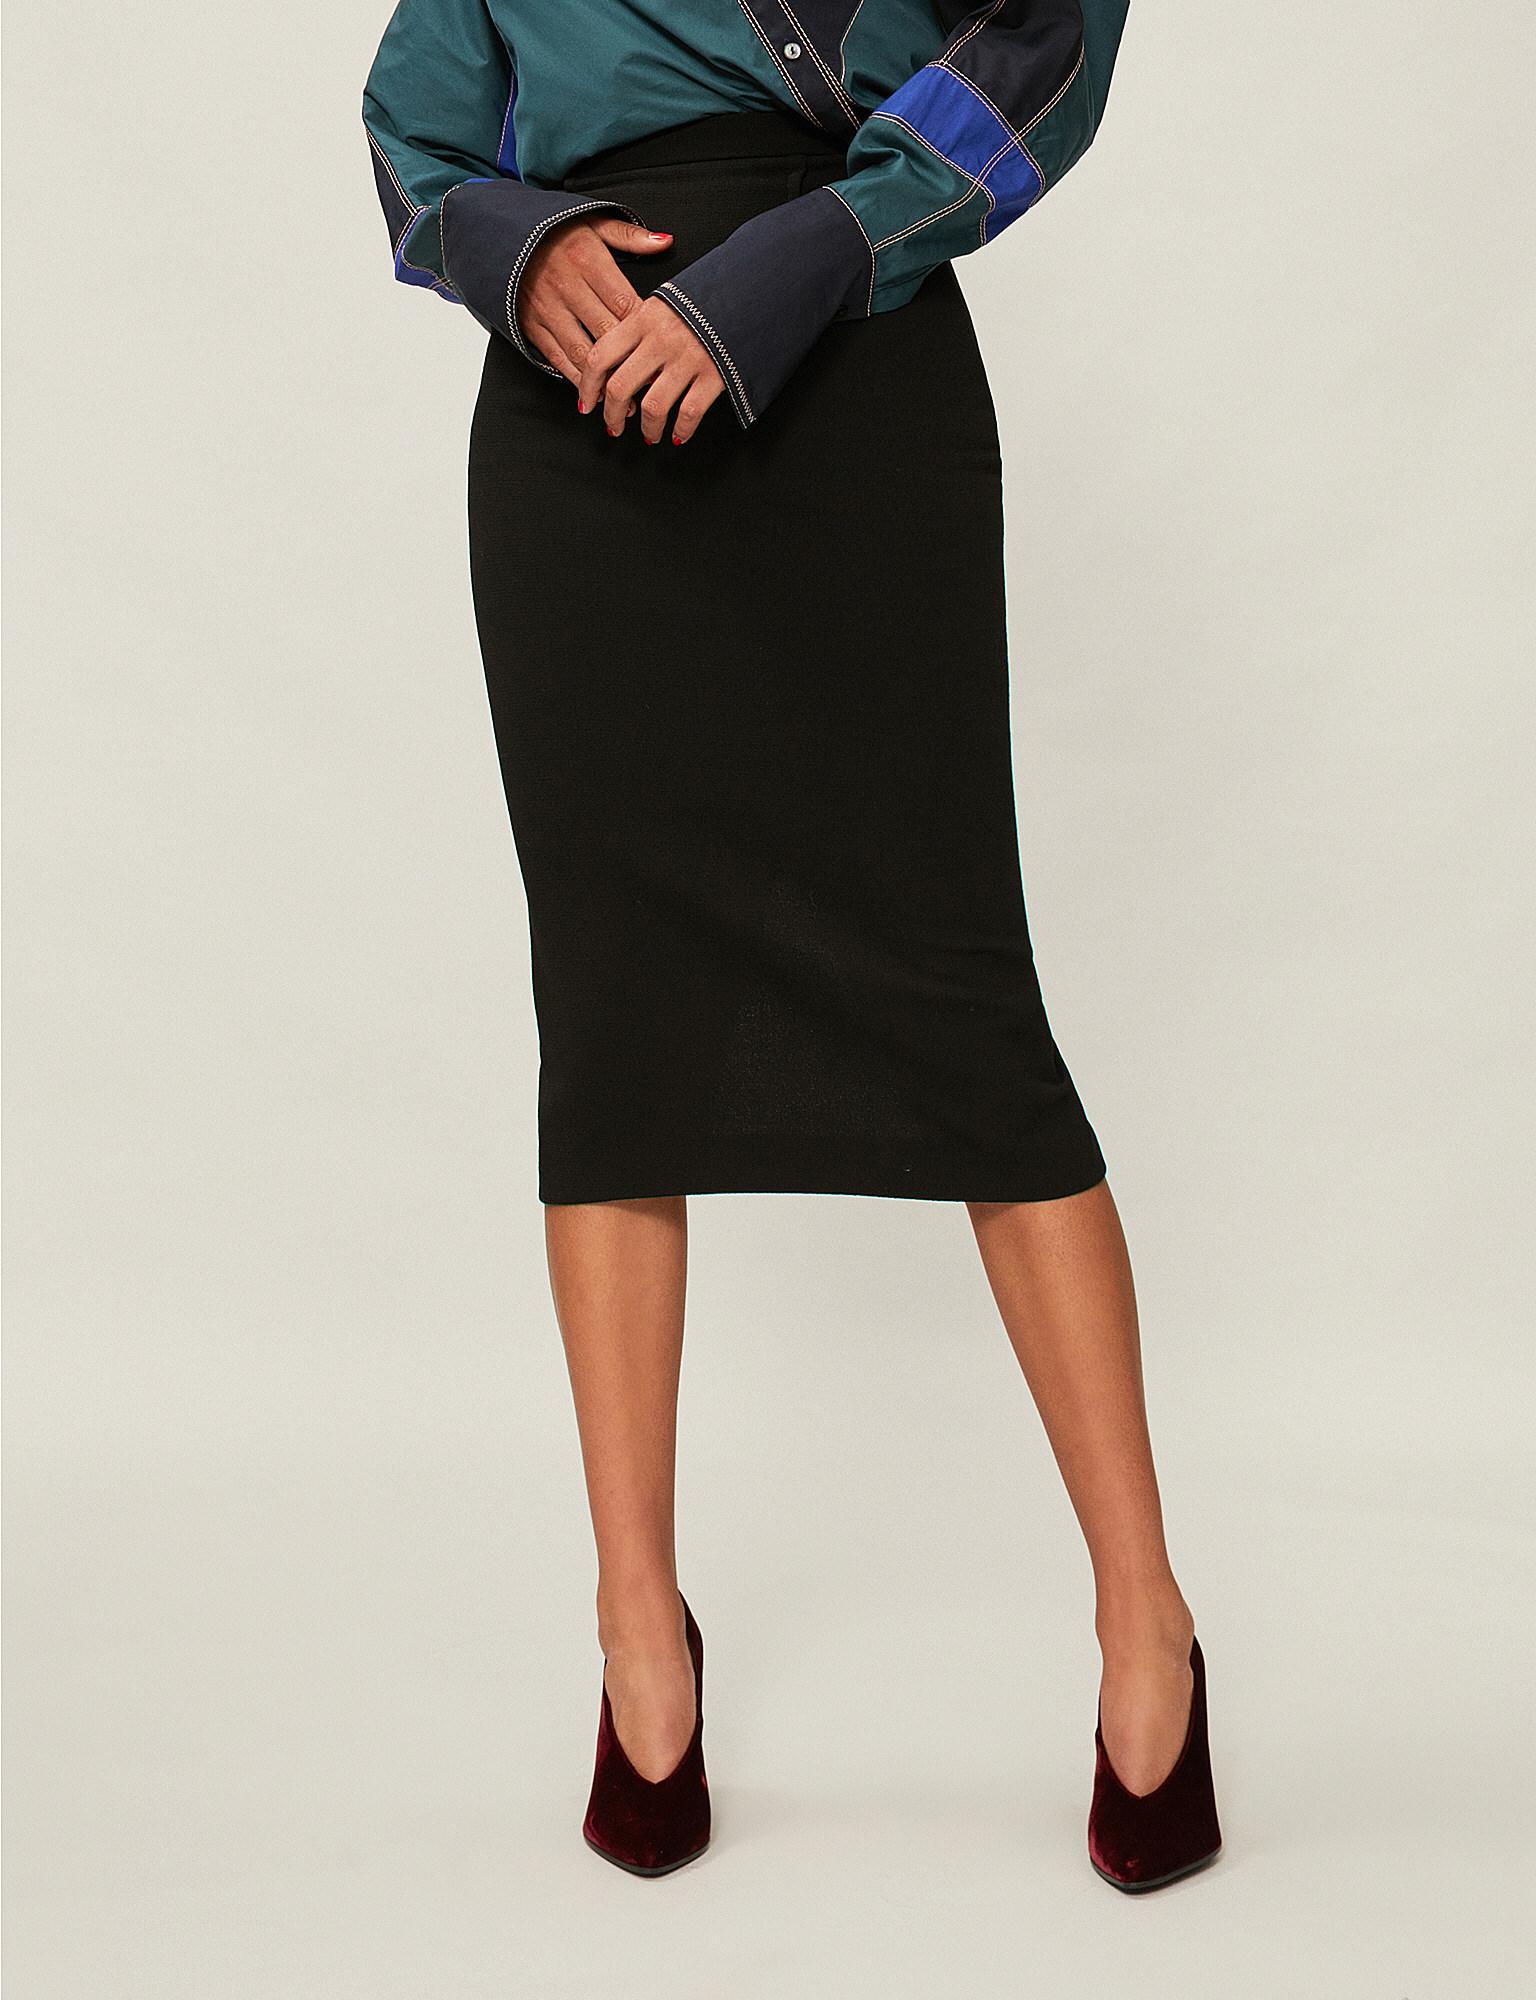 a956e0603 Roland Mouret Arreton Wool Skirt in Black - Lyst